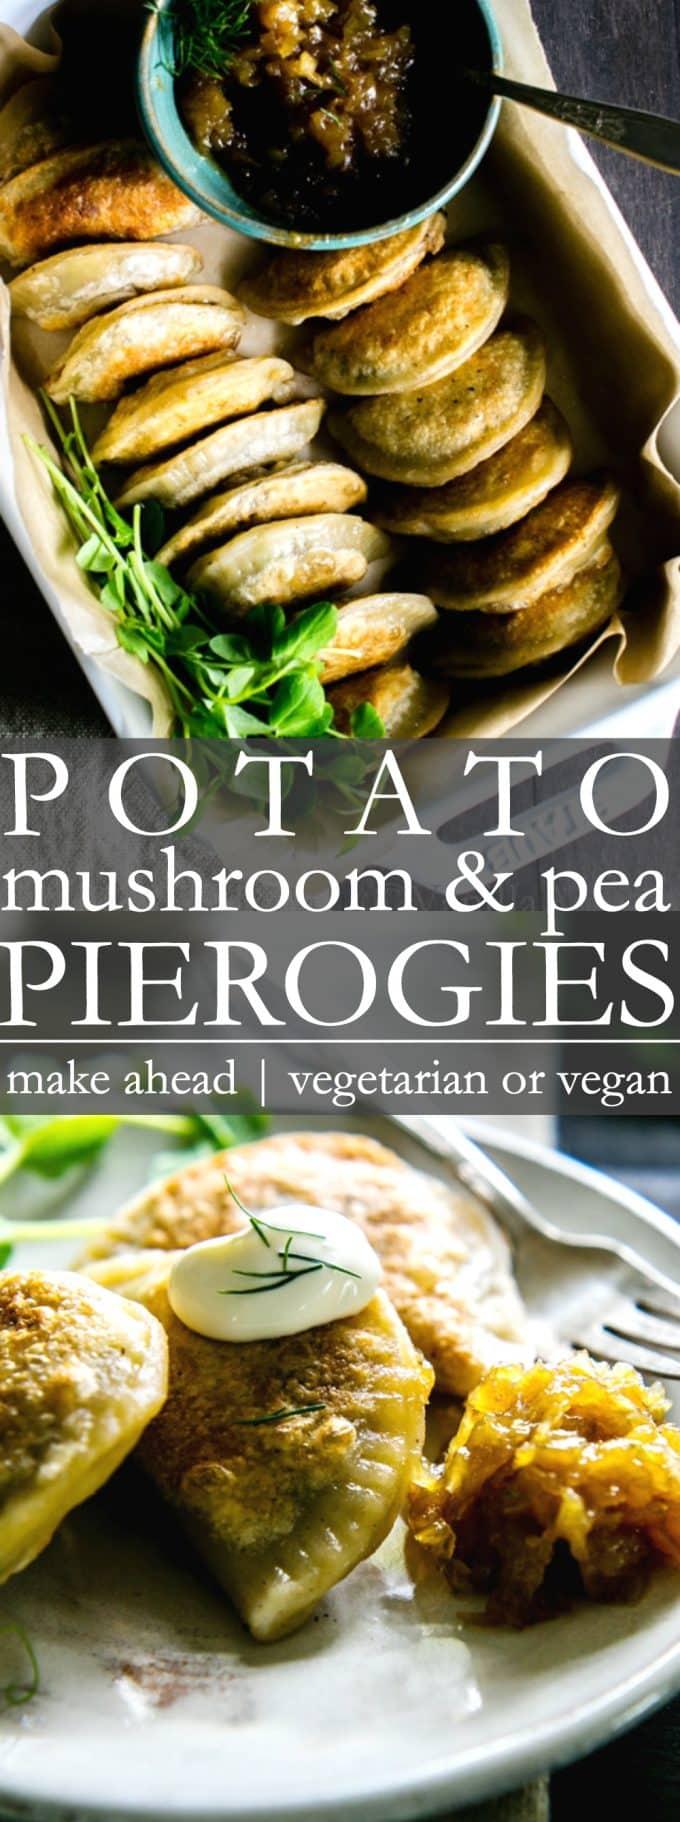 Vegetarian or Vegan Pierogies